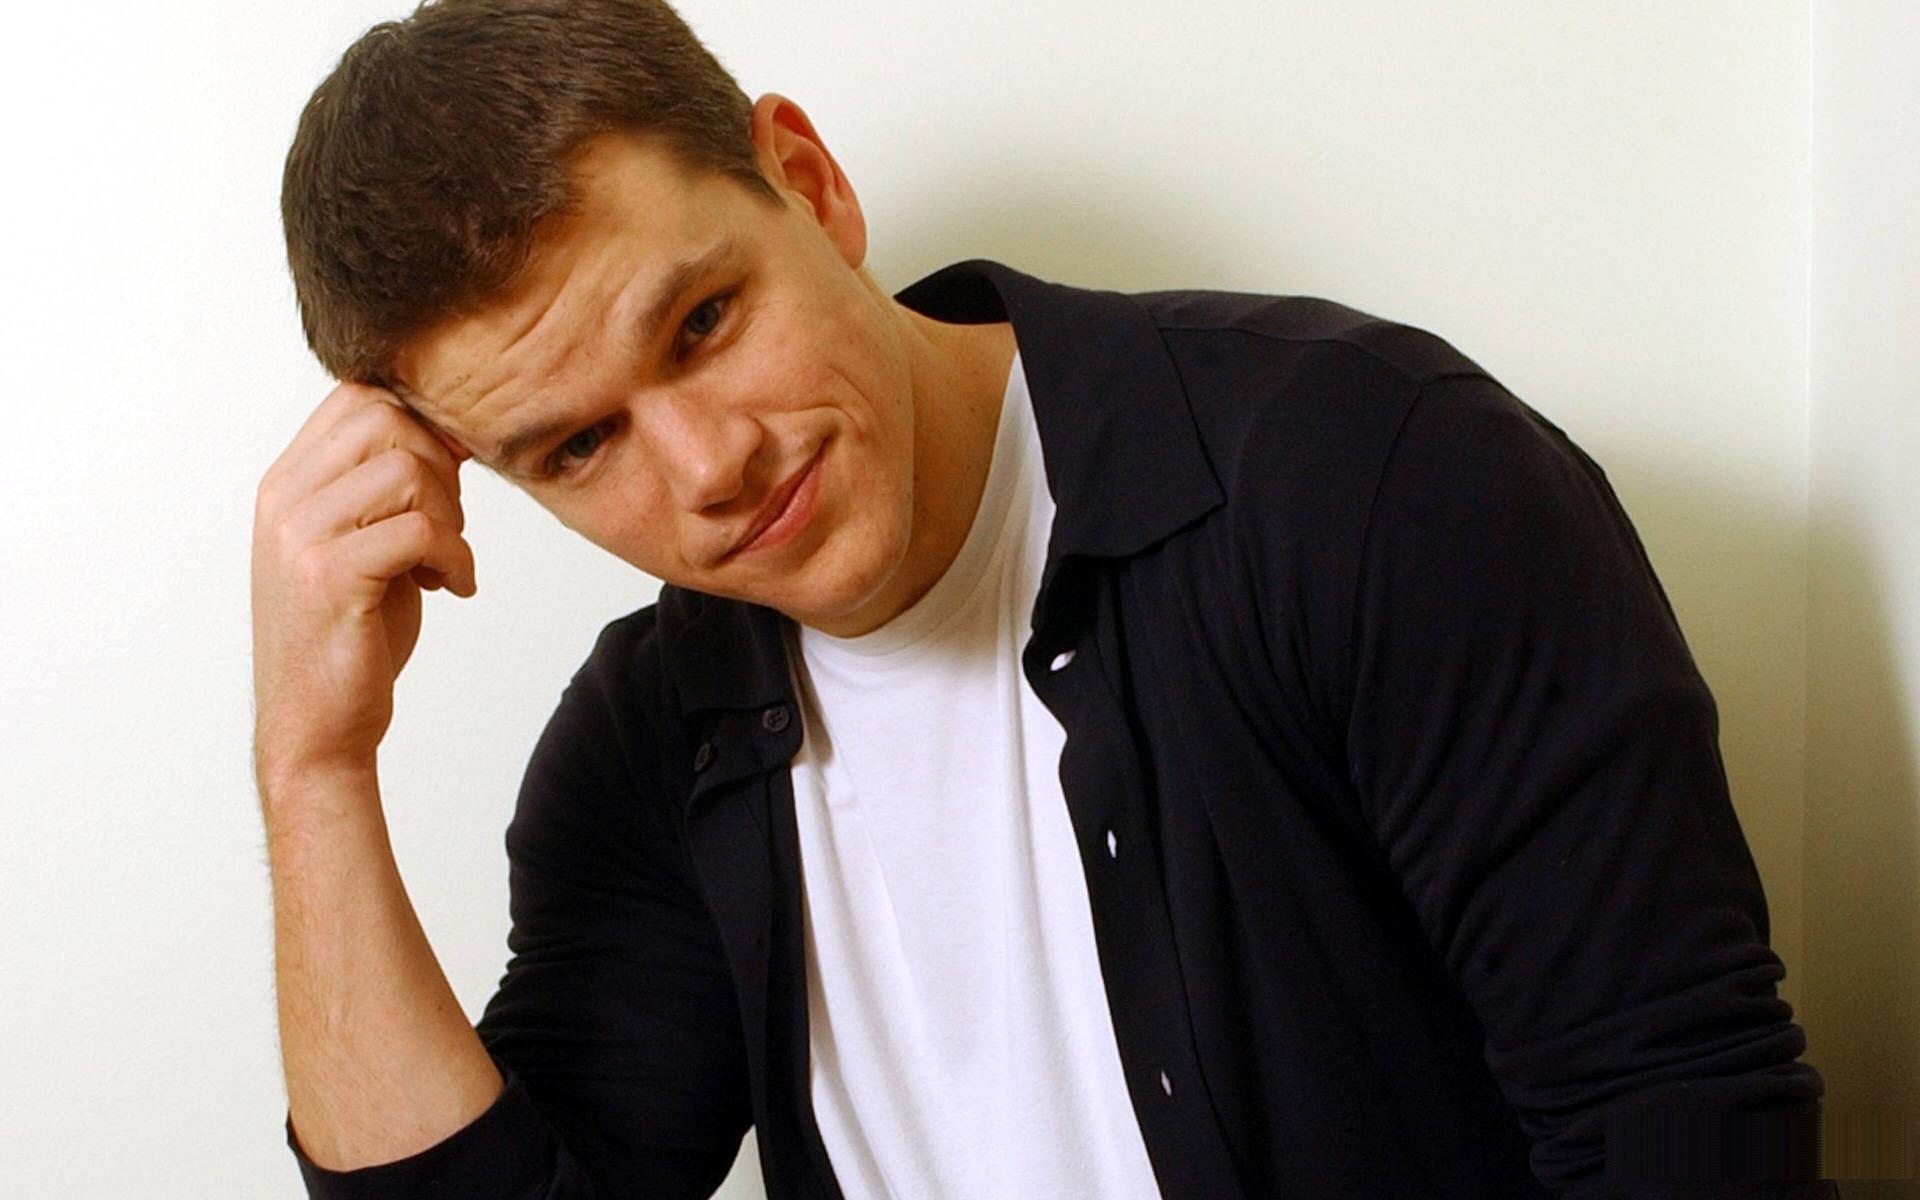 Matt Damon Nude And Hot Gay Scenes